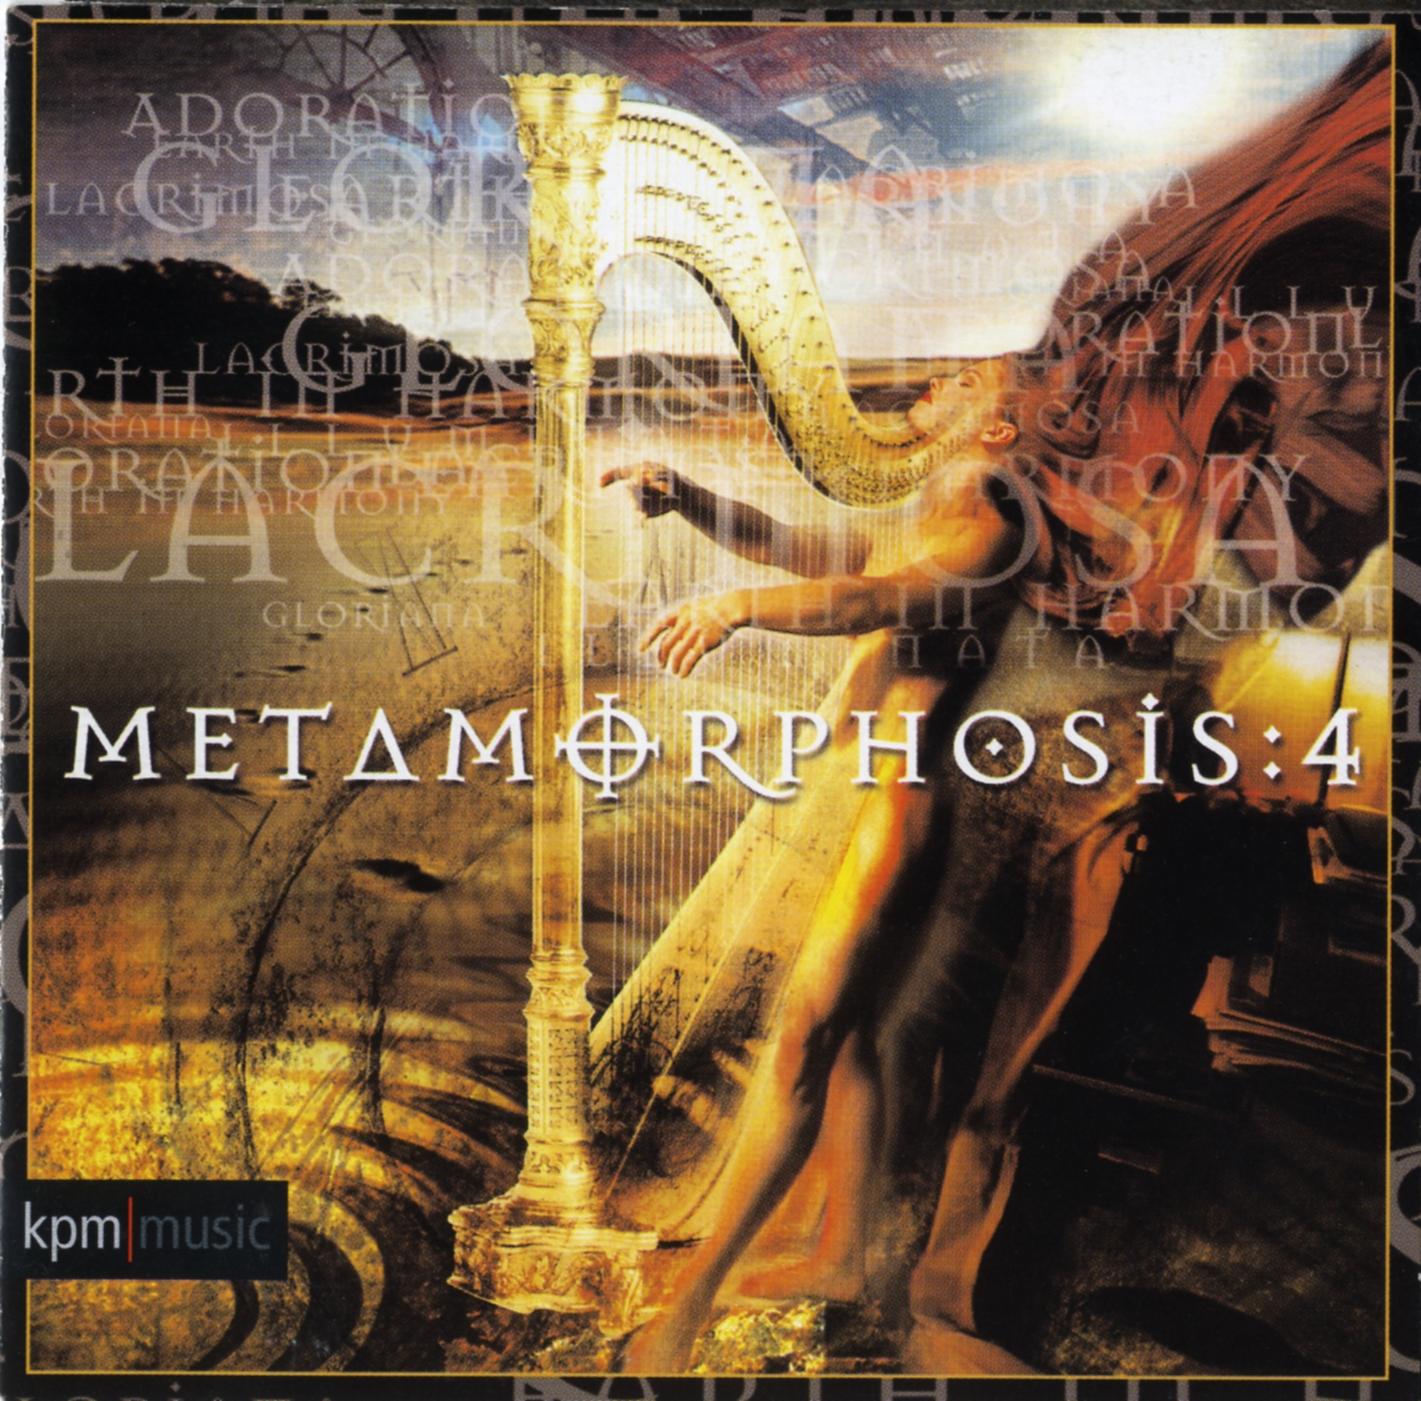 album cover for metamorphosis 4.